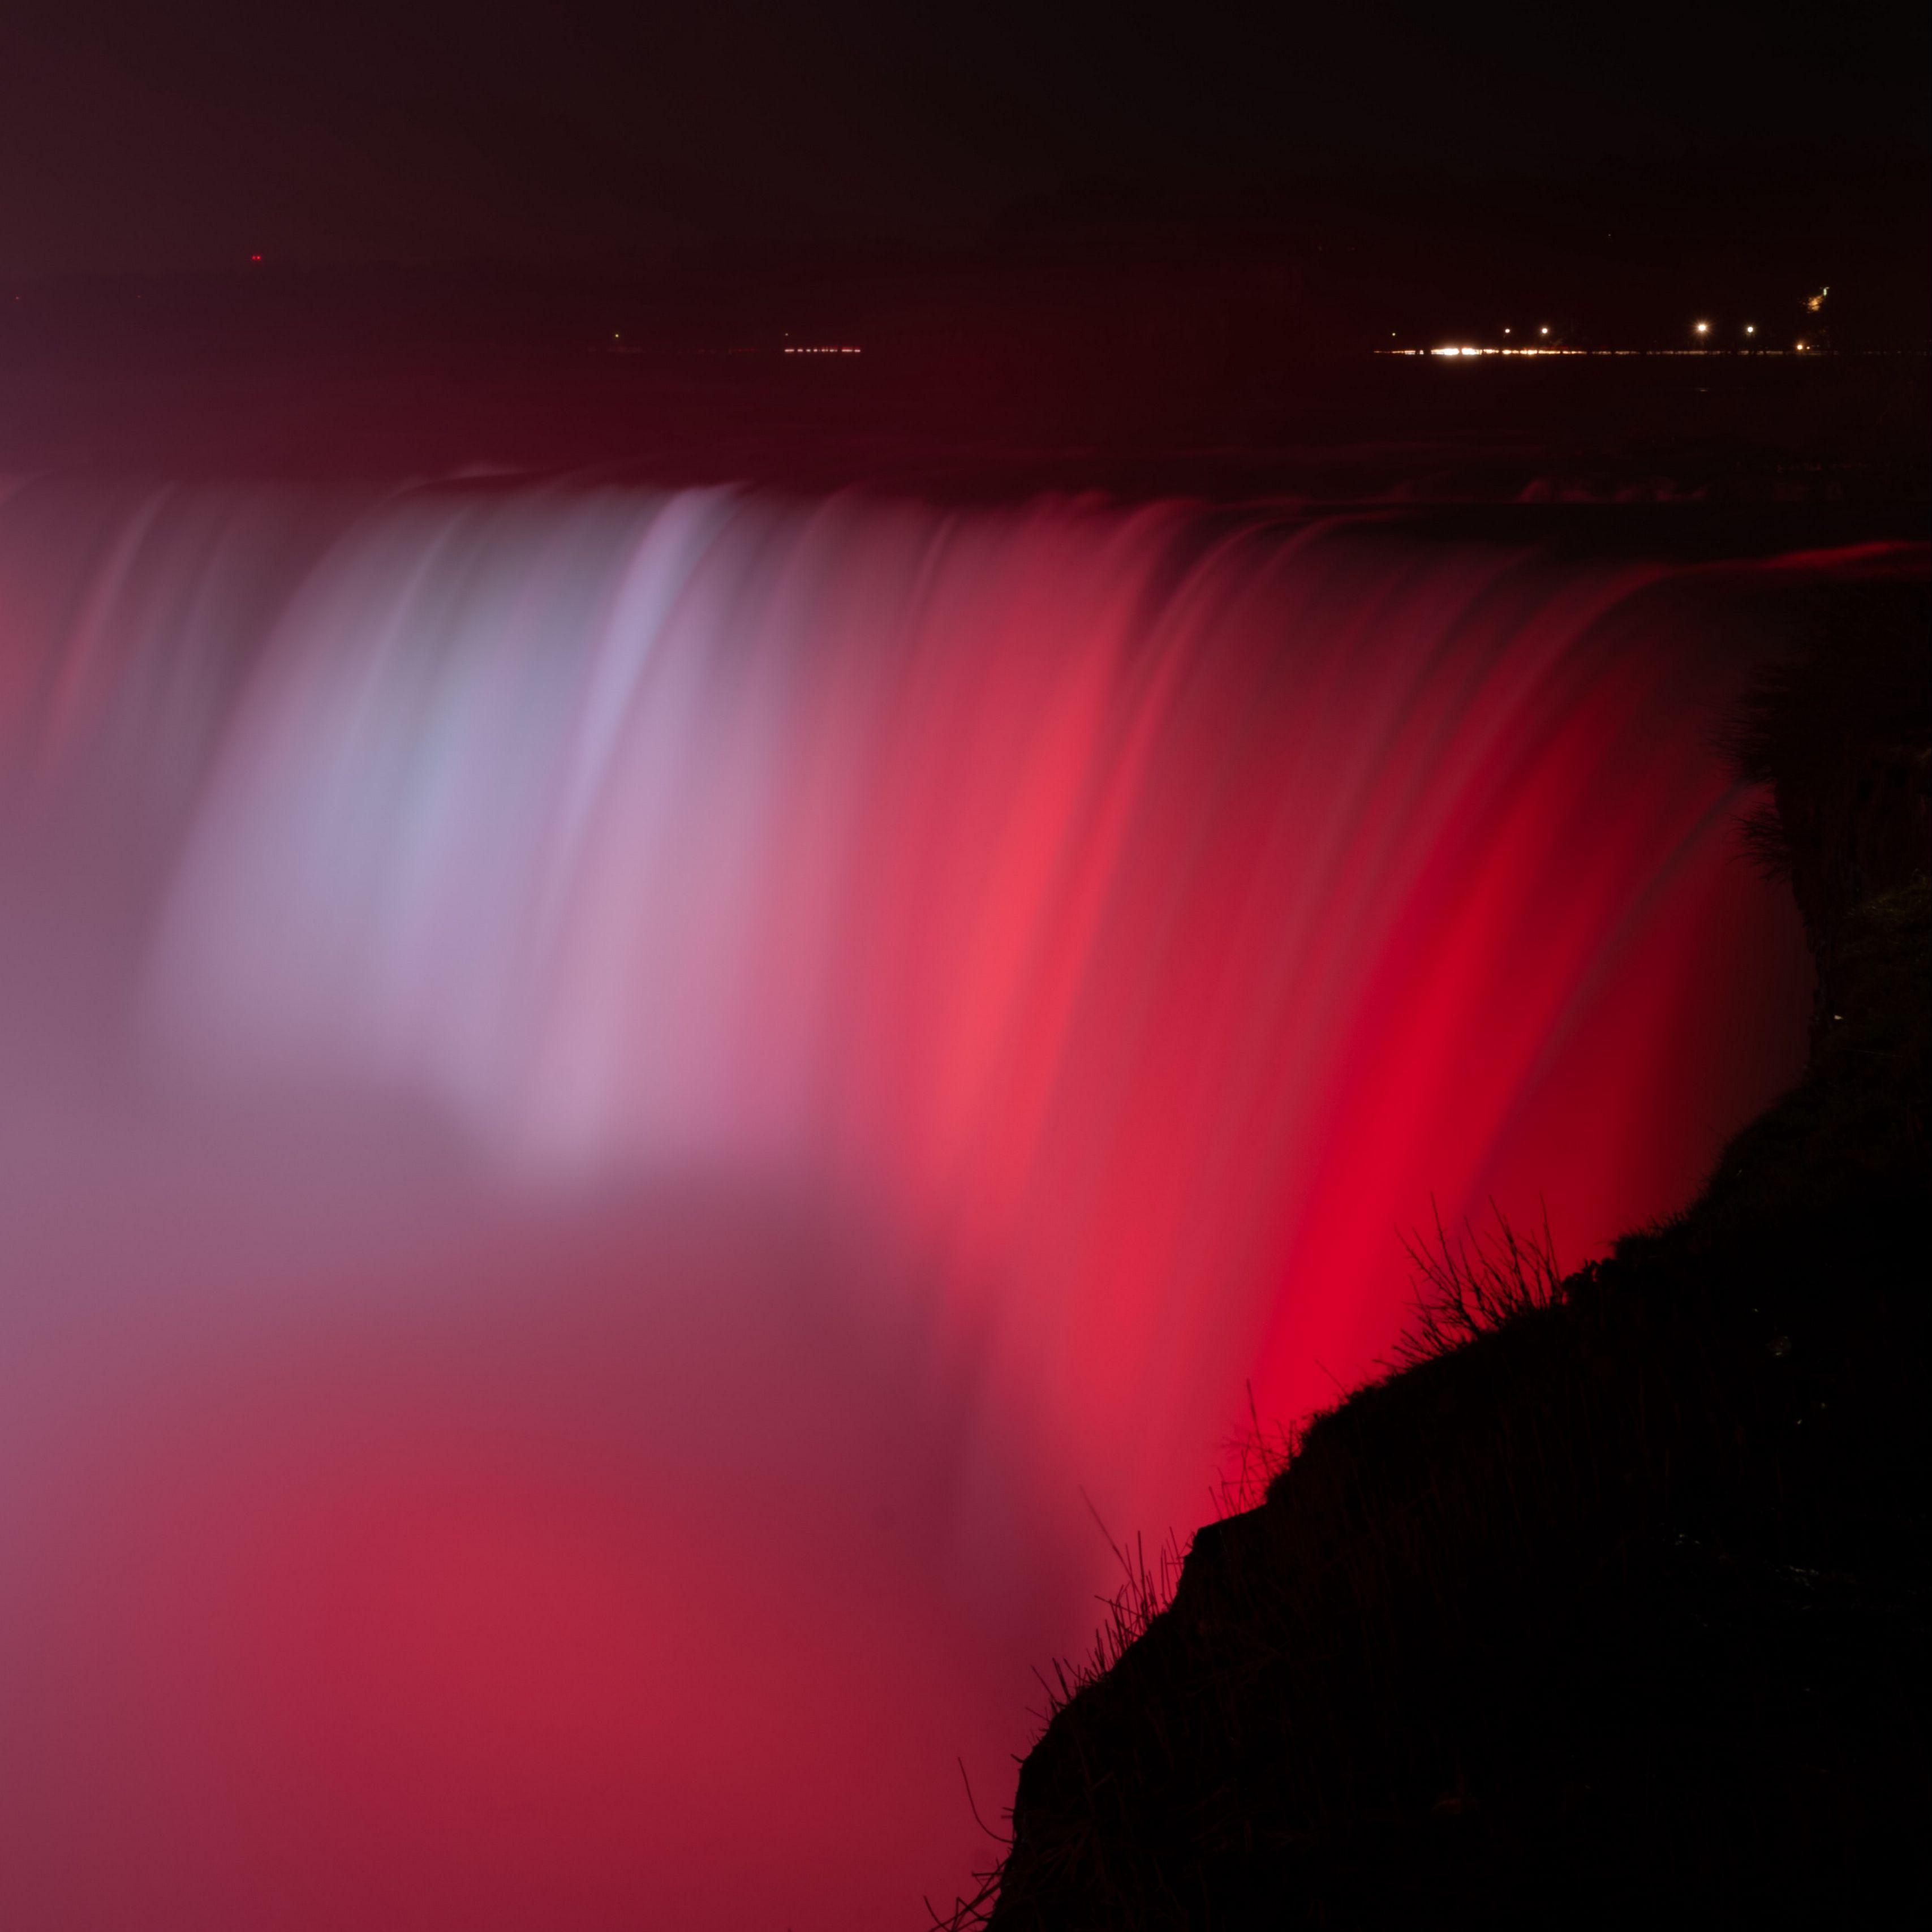 3415x3415 Wallpaper waterfall, fog, backlight, red, dark